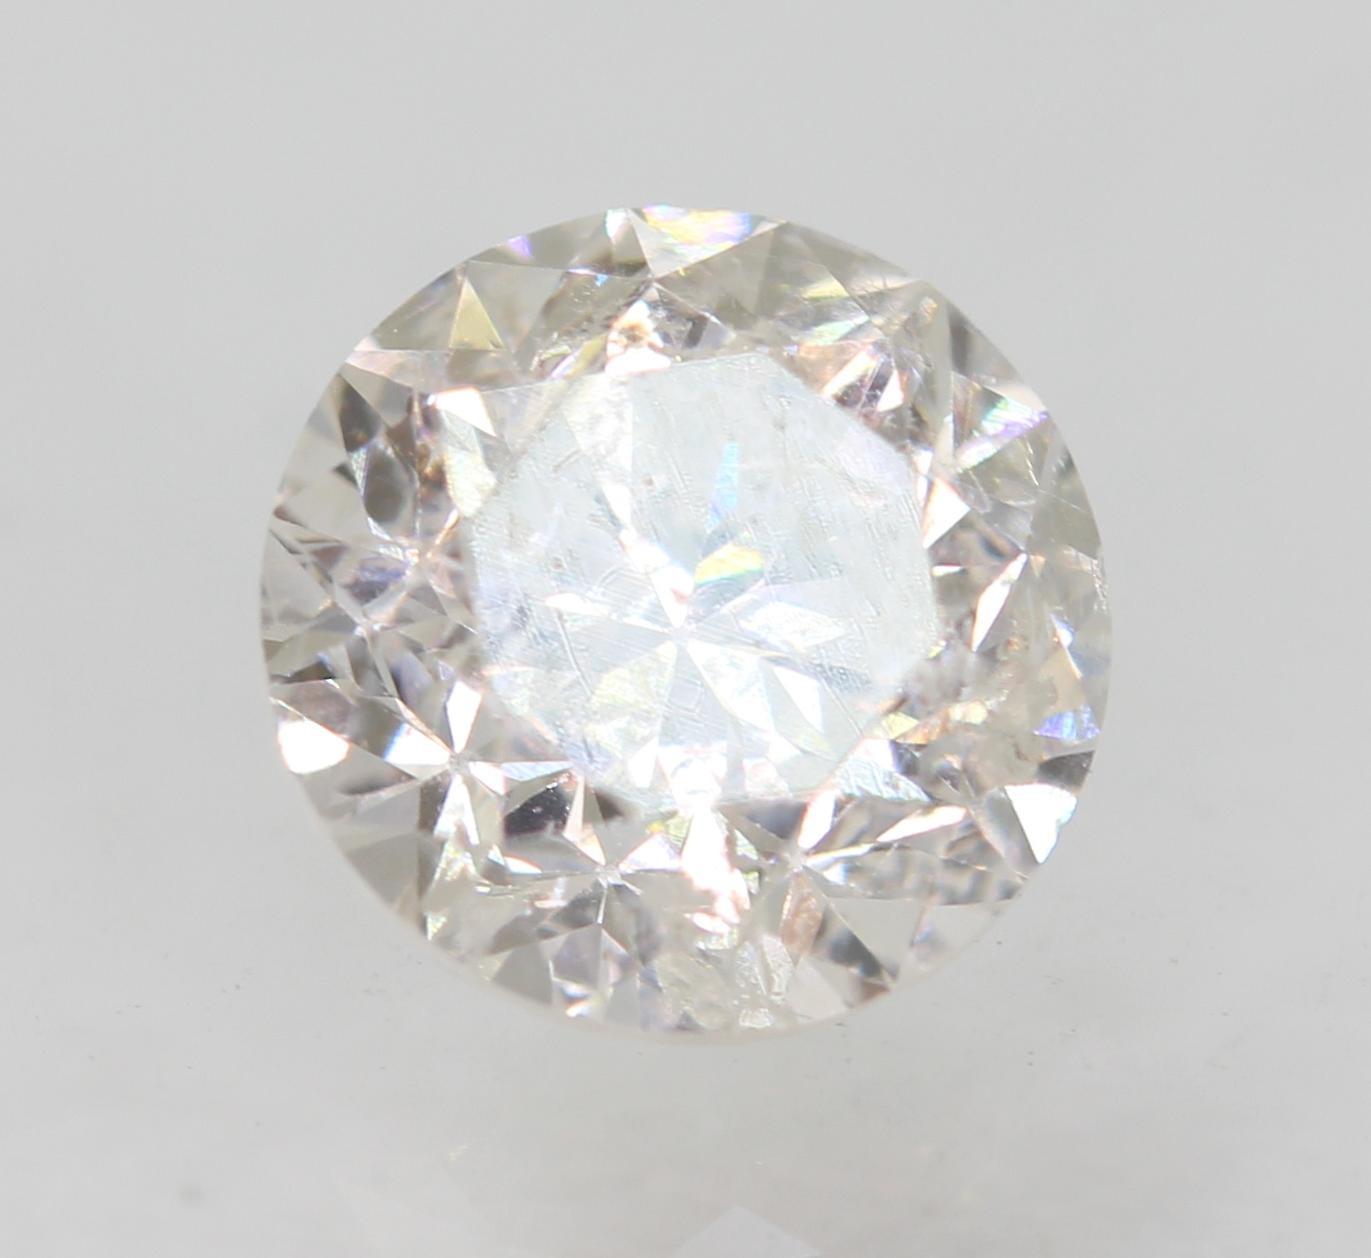 Certified 0.70 Carat E SI2 Round Brilliant Enhanced Natural Loose Diamond 5.47mm